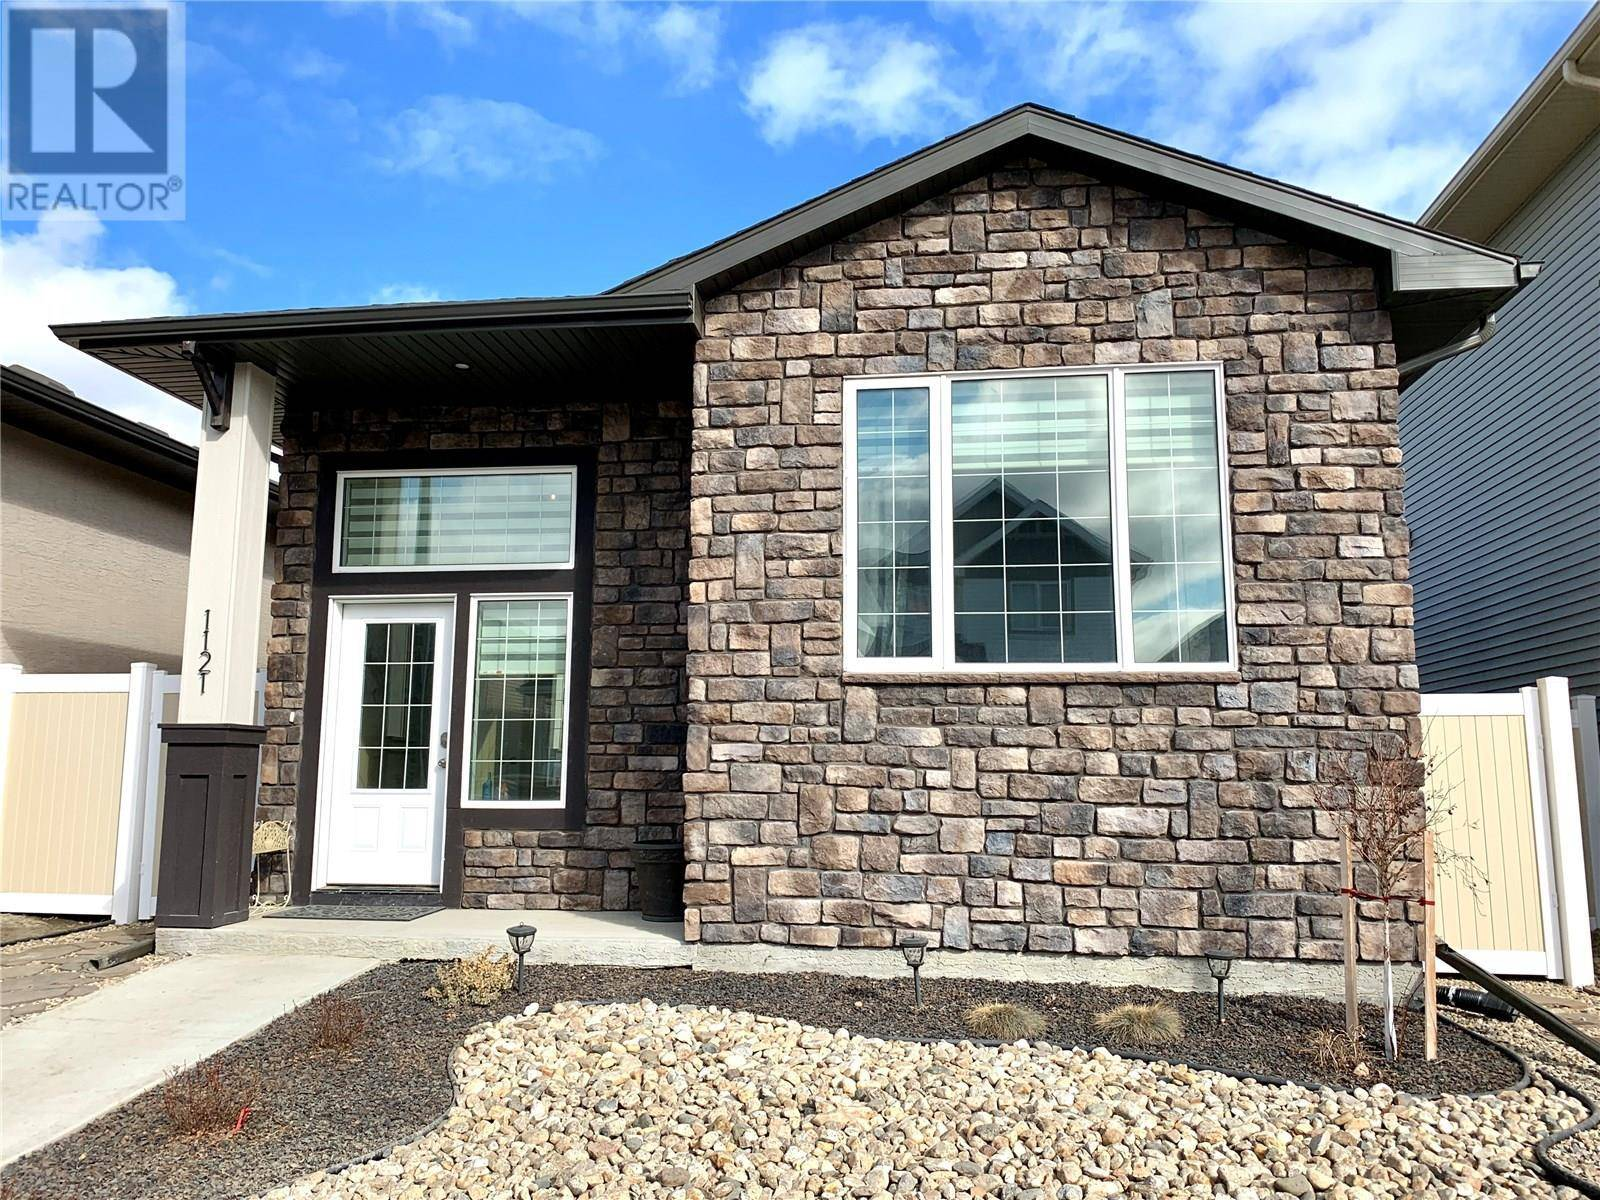 House for sale at 1121 Poley St N Regina Saskatchewan - MLS: SK764271